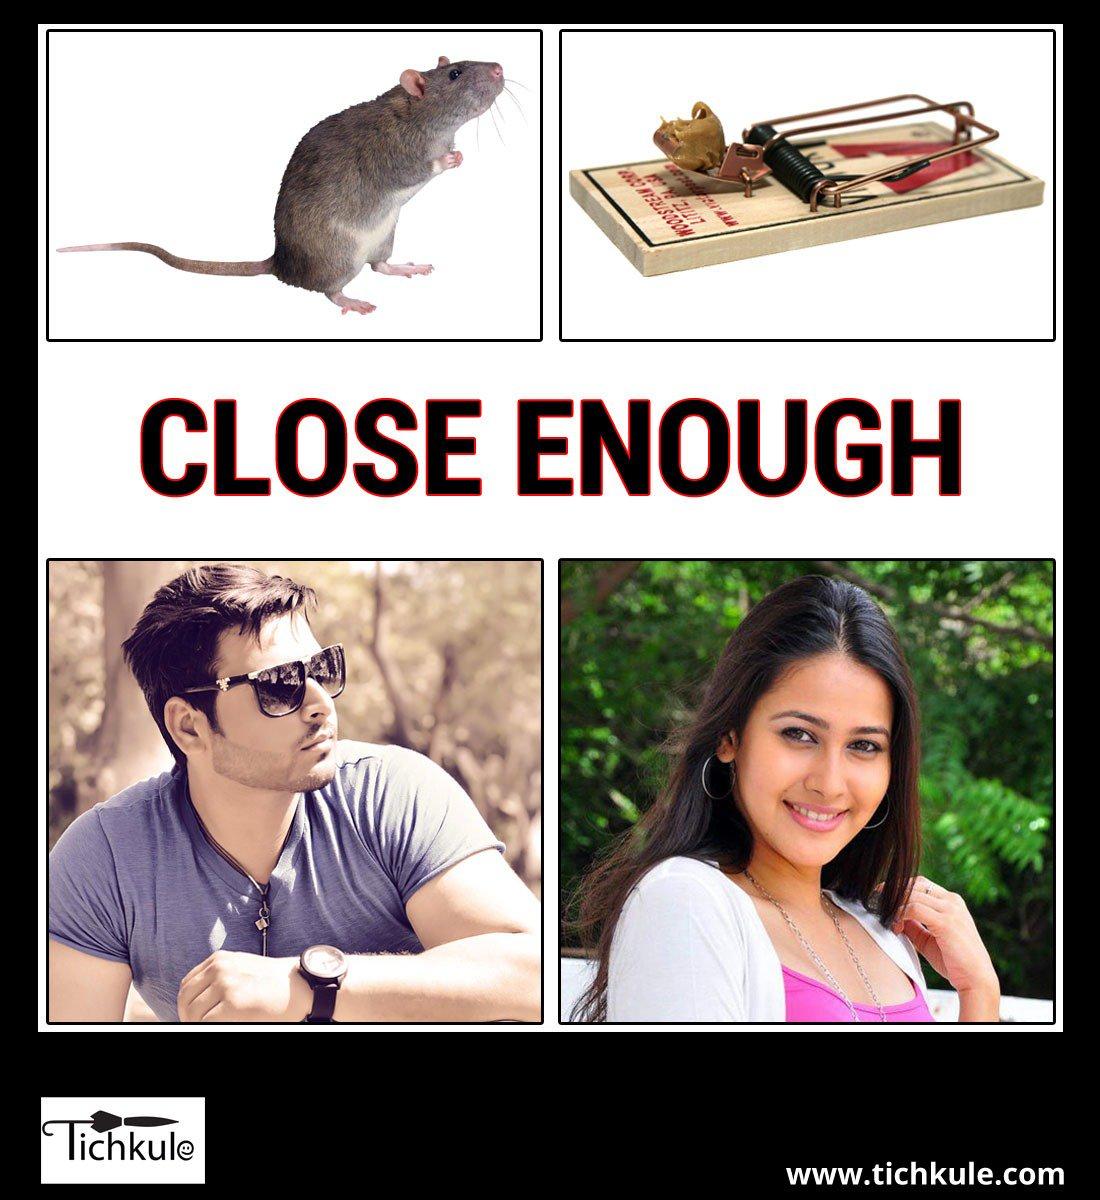 Close Enough......  #follo4follo #Follies #folloback #follobackinstantly #follobackSeguro #FolloForFolloBack #folowback #FolloMe<br>http://pic.twitter.com/c8MXhFGjjB